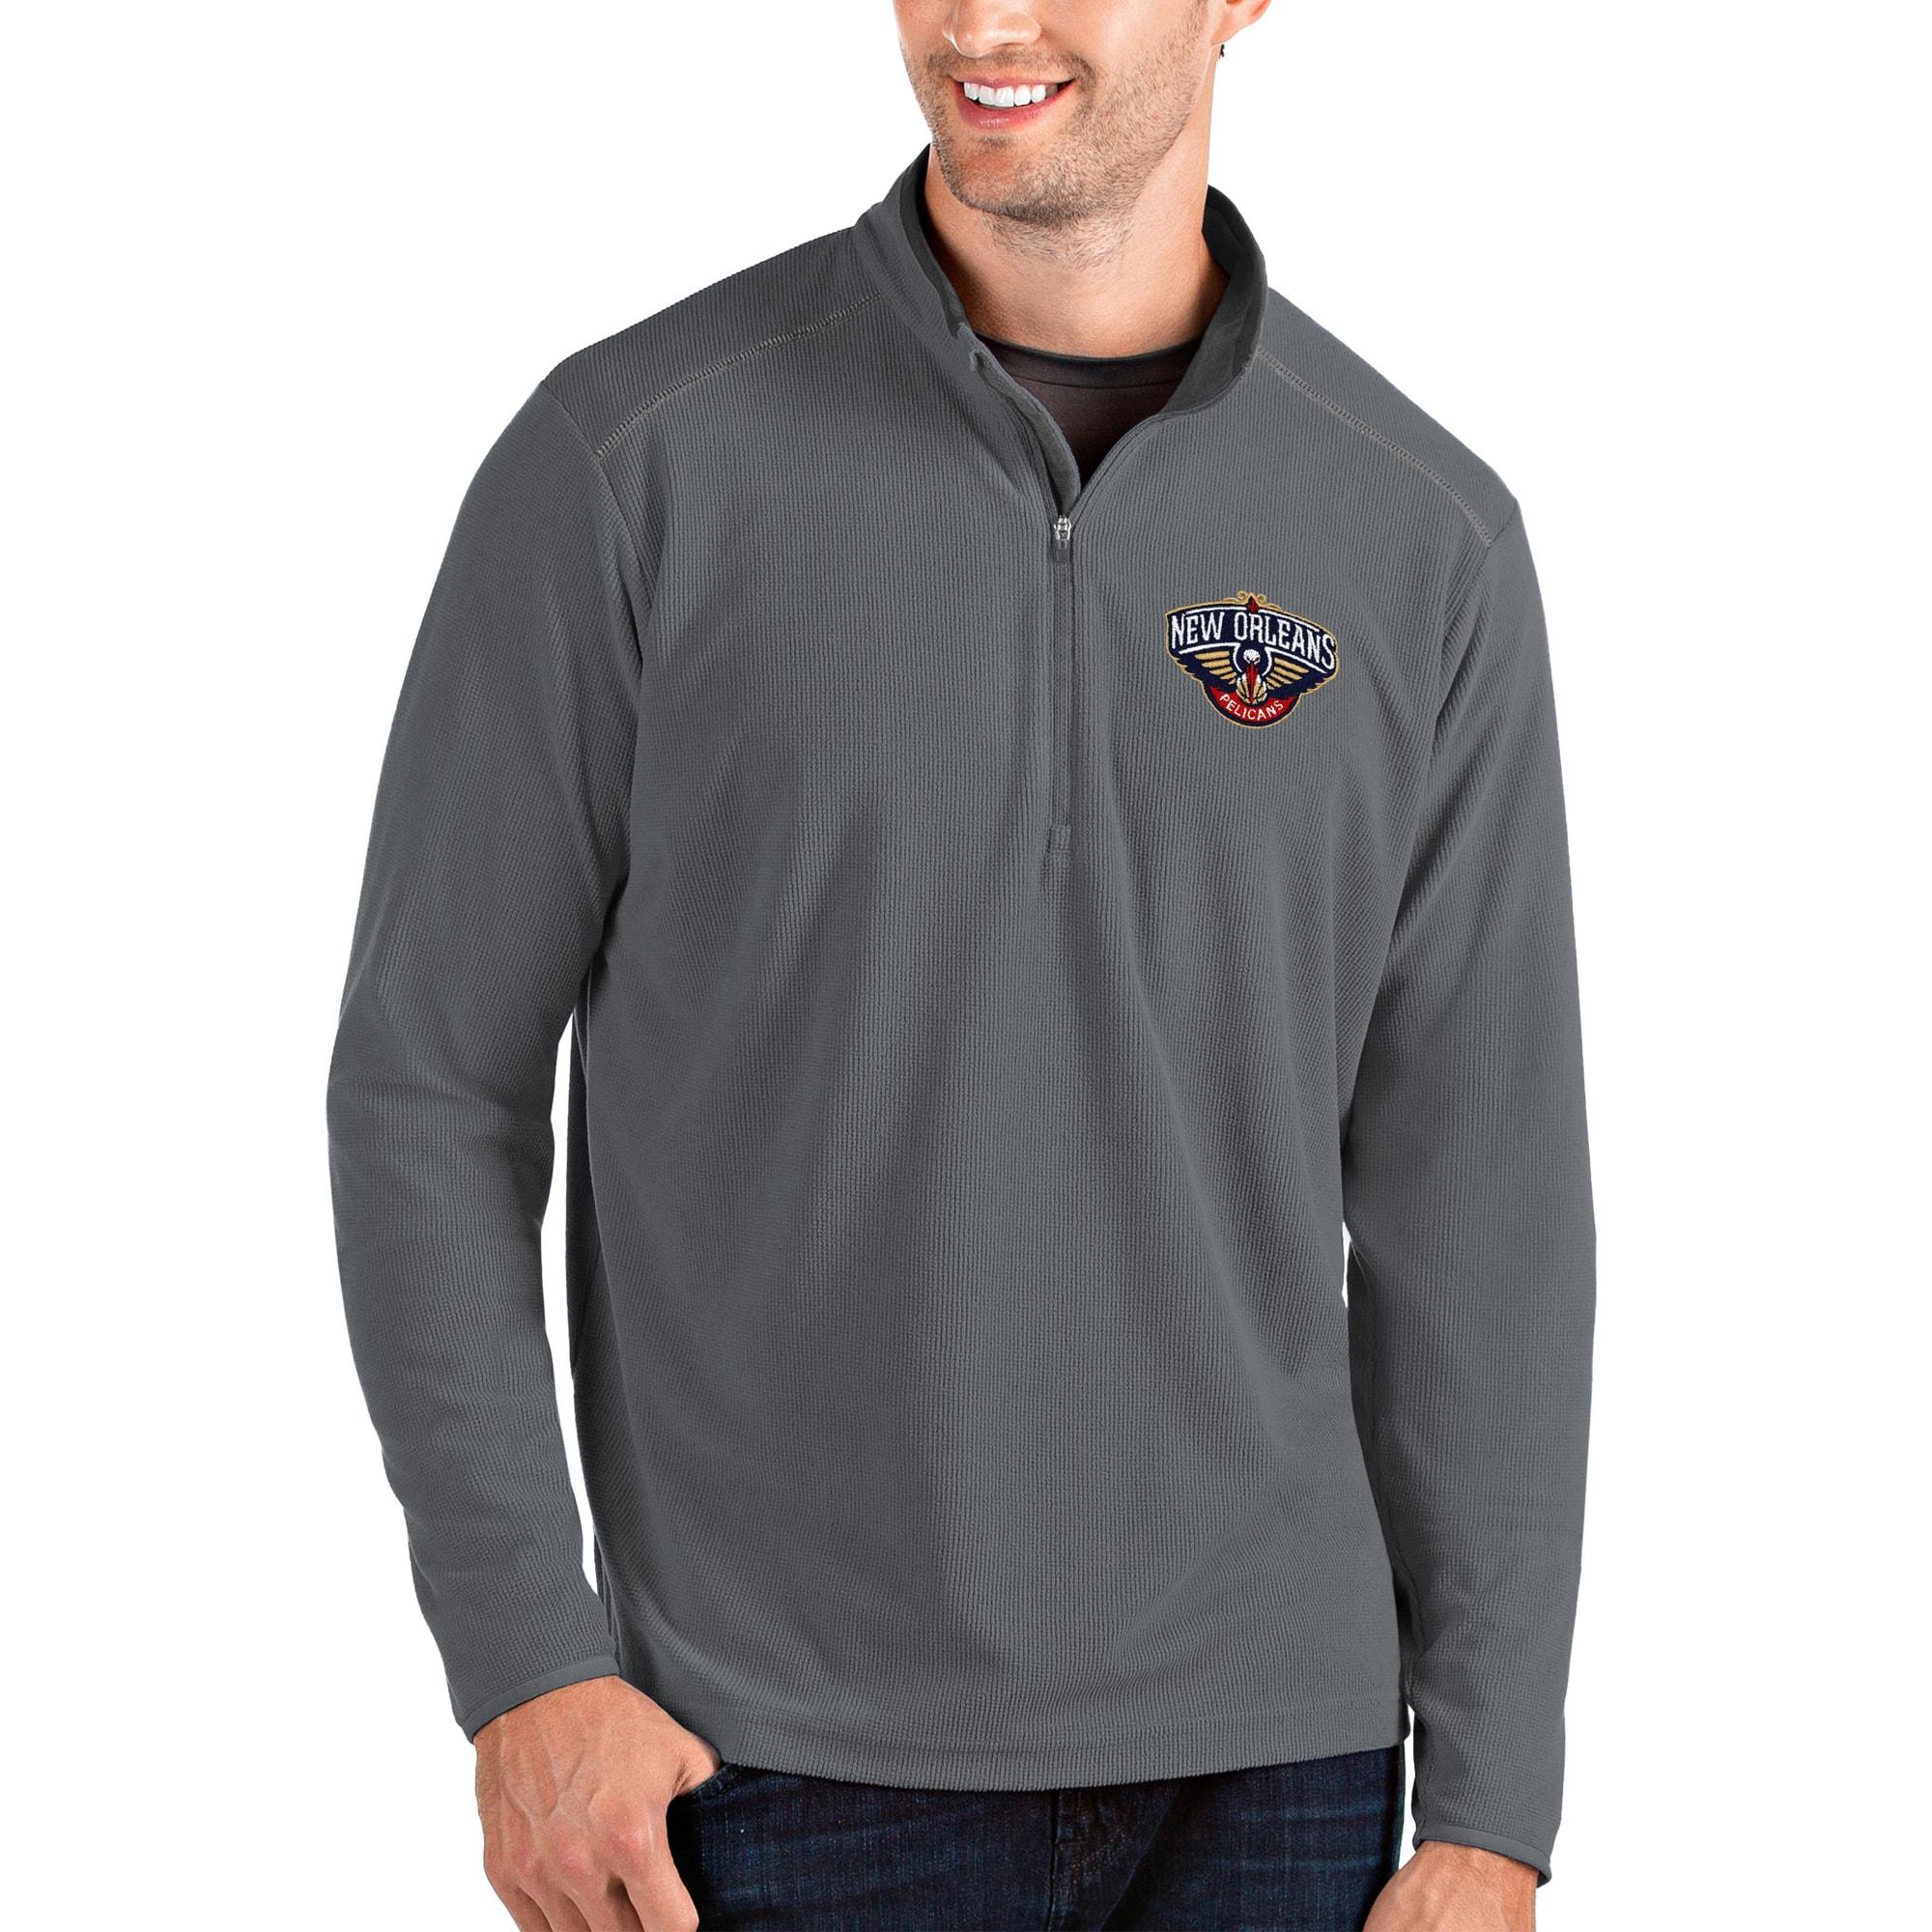 New Orleans Pelicans Antigua Glacier Quarter-Zip Pullover Jacket - Charcoal/Gray